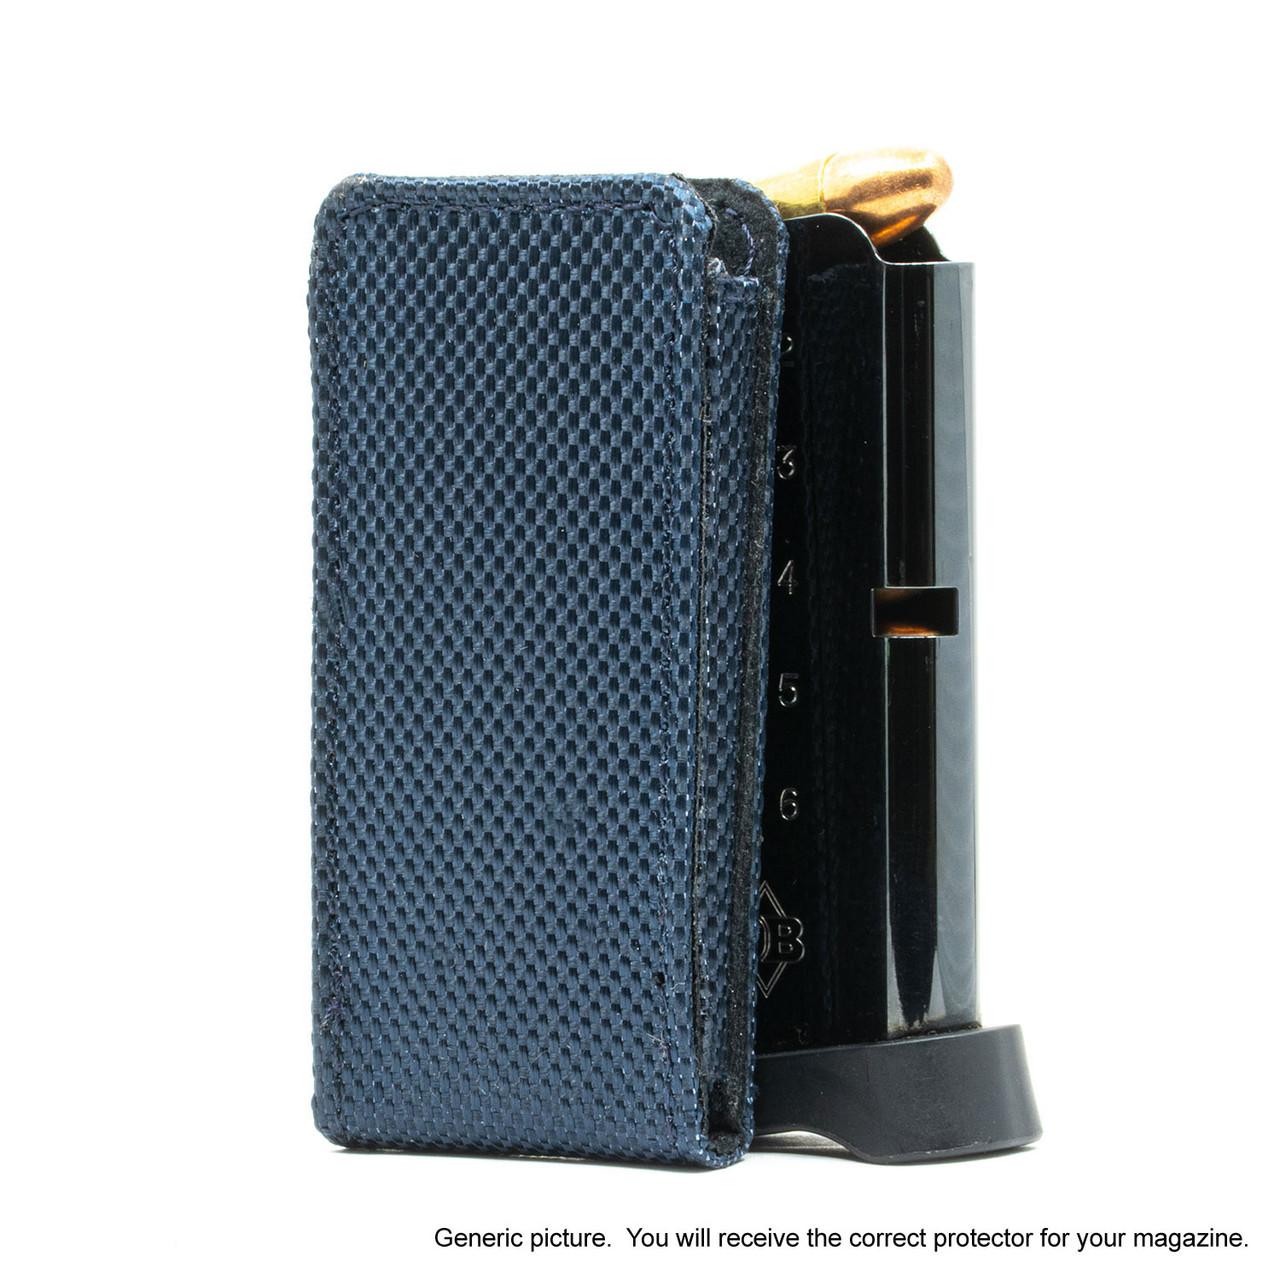 Remington R51 Blue Covert Magazine Pocket Protector